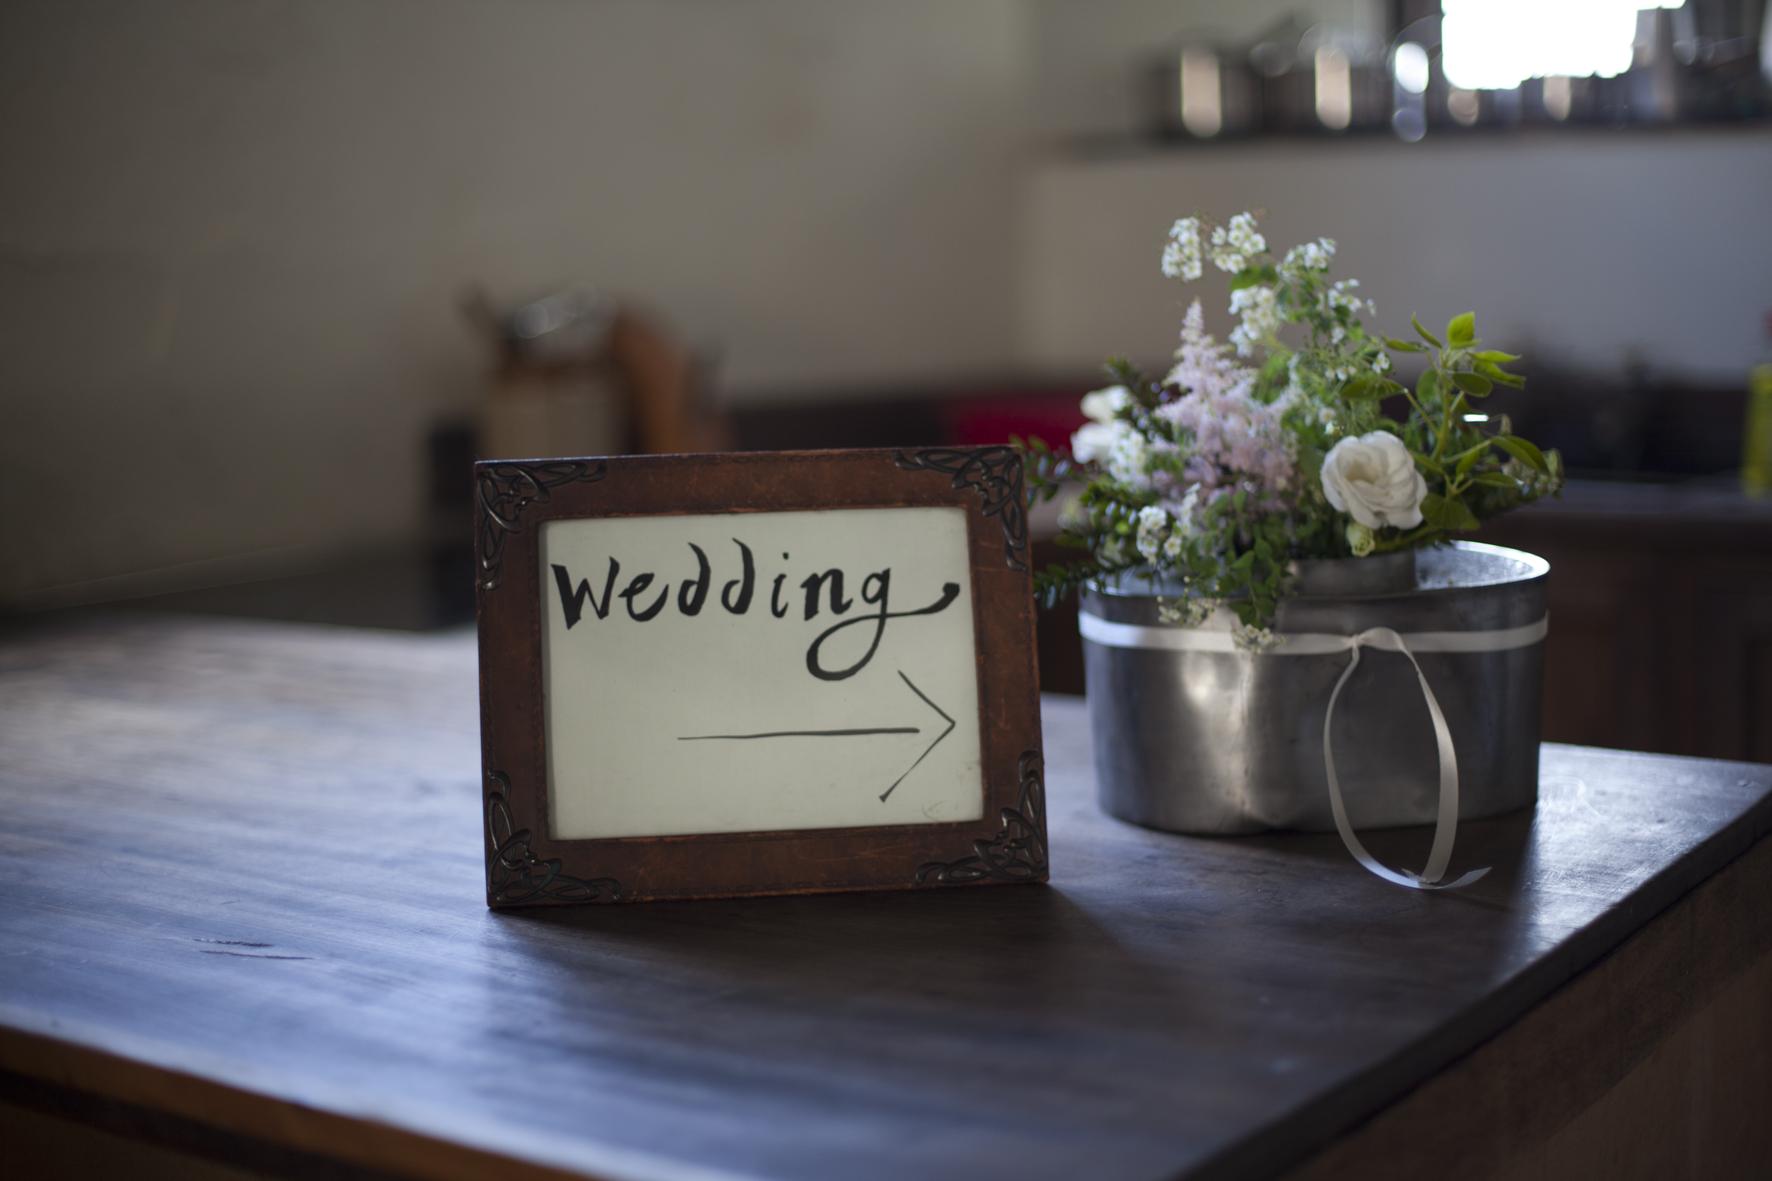 Wedding example_M&P__MG_2621_Claudia Leisinger.jpg